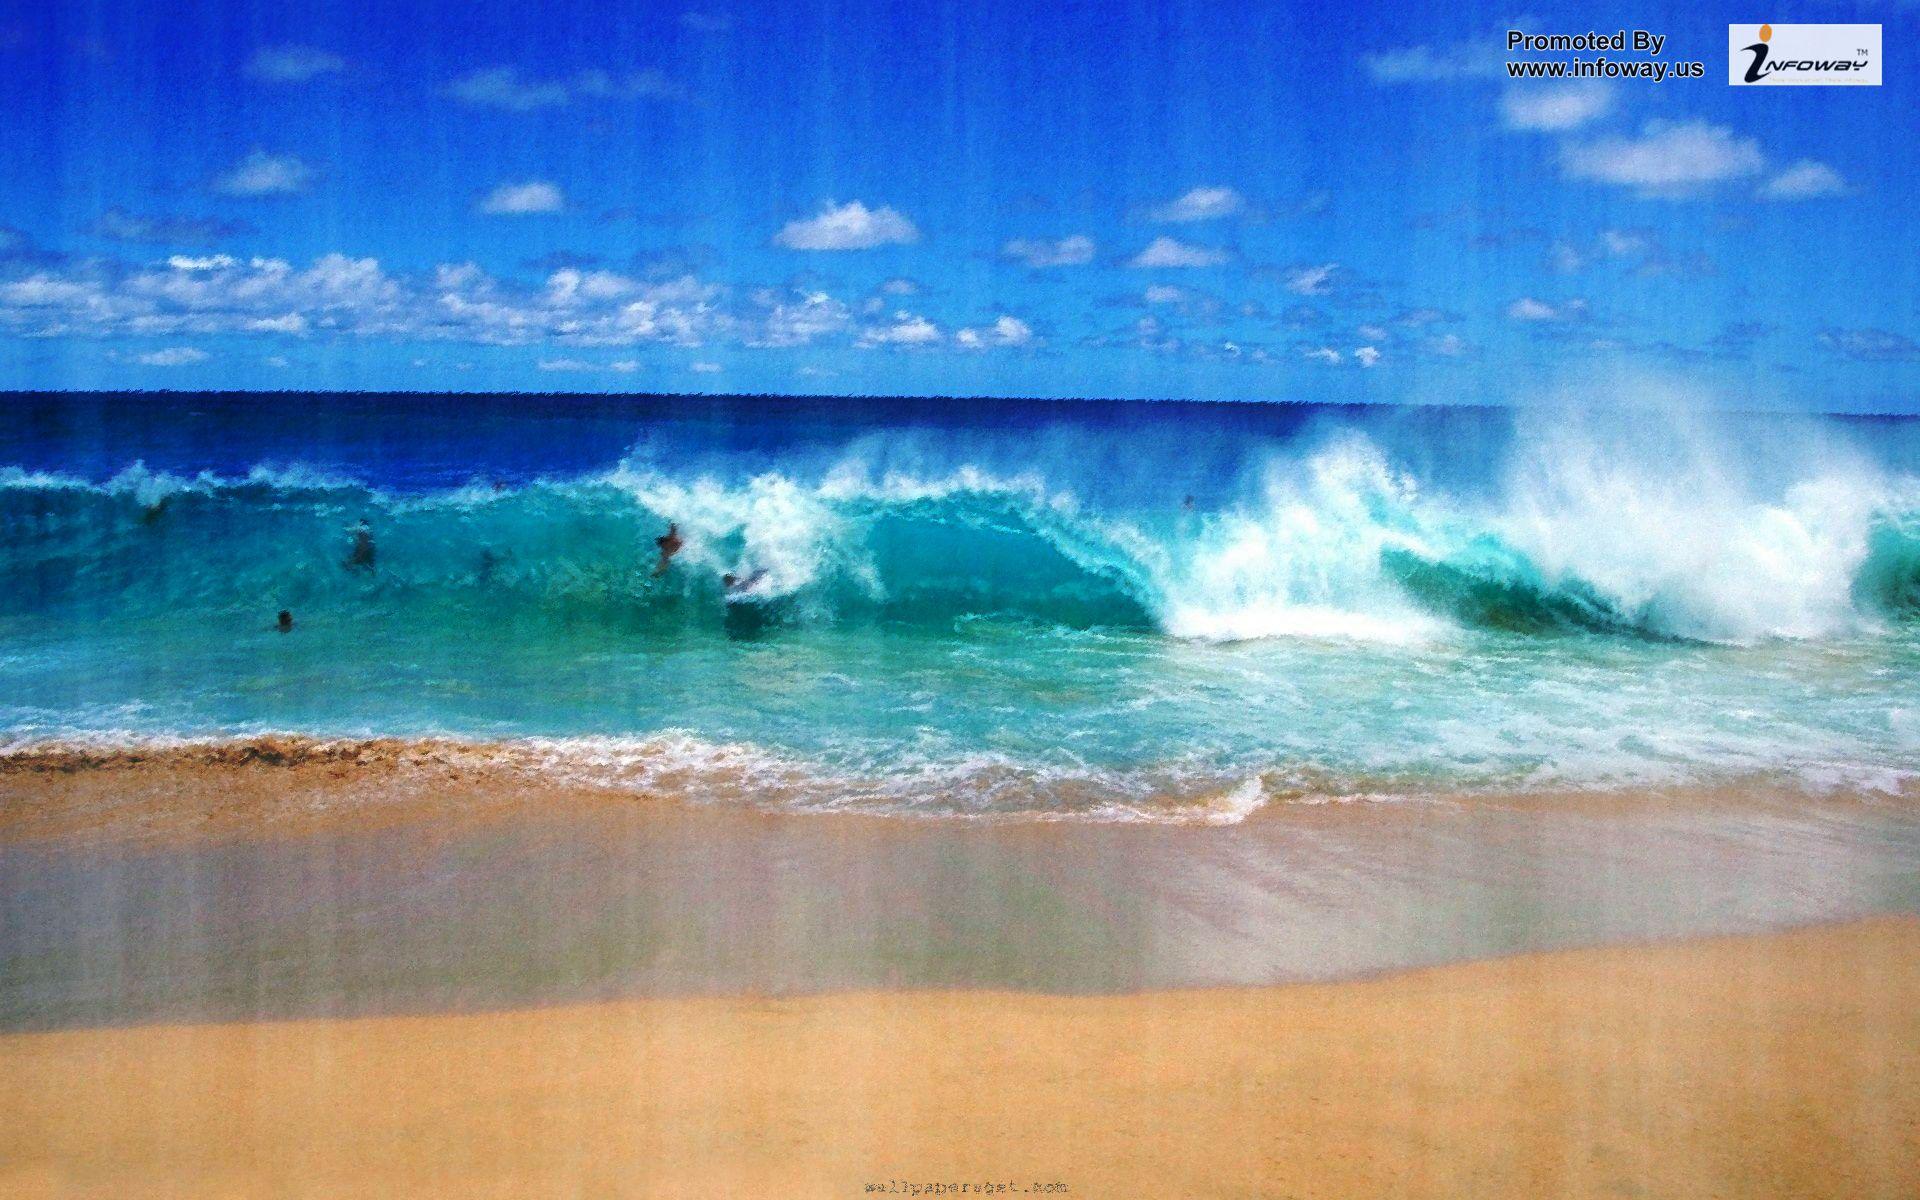 beautiful ocean wallpaper   wwwhigh definition wallpapercom 1920x1200